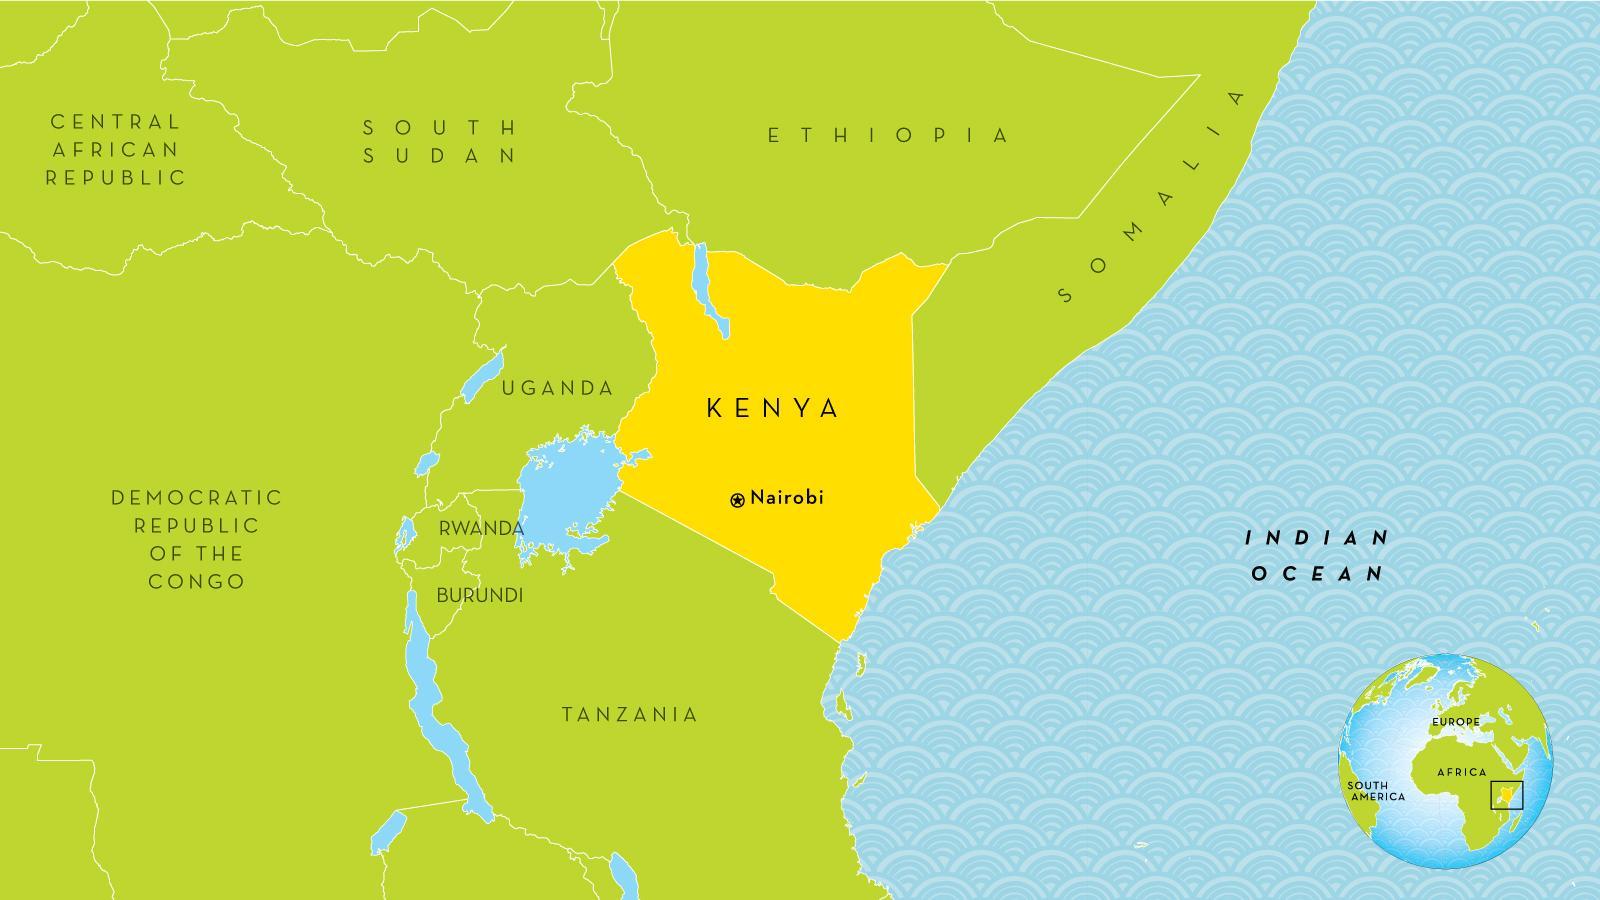 Karte Anzeigen.Nairobi Kenia Karte Nairobi Kenia Auf Der Karte Ost